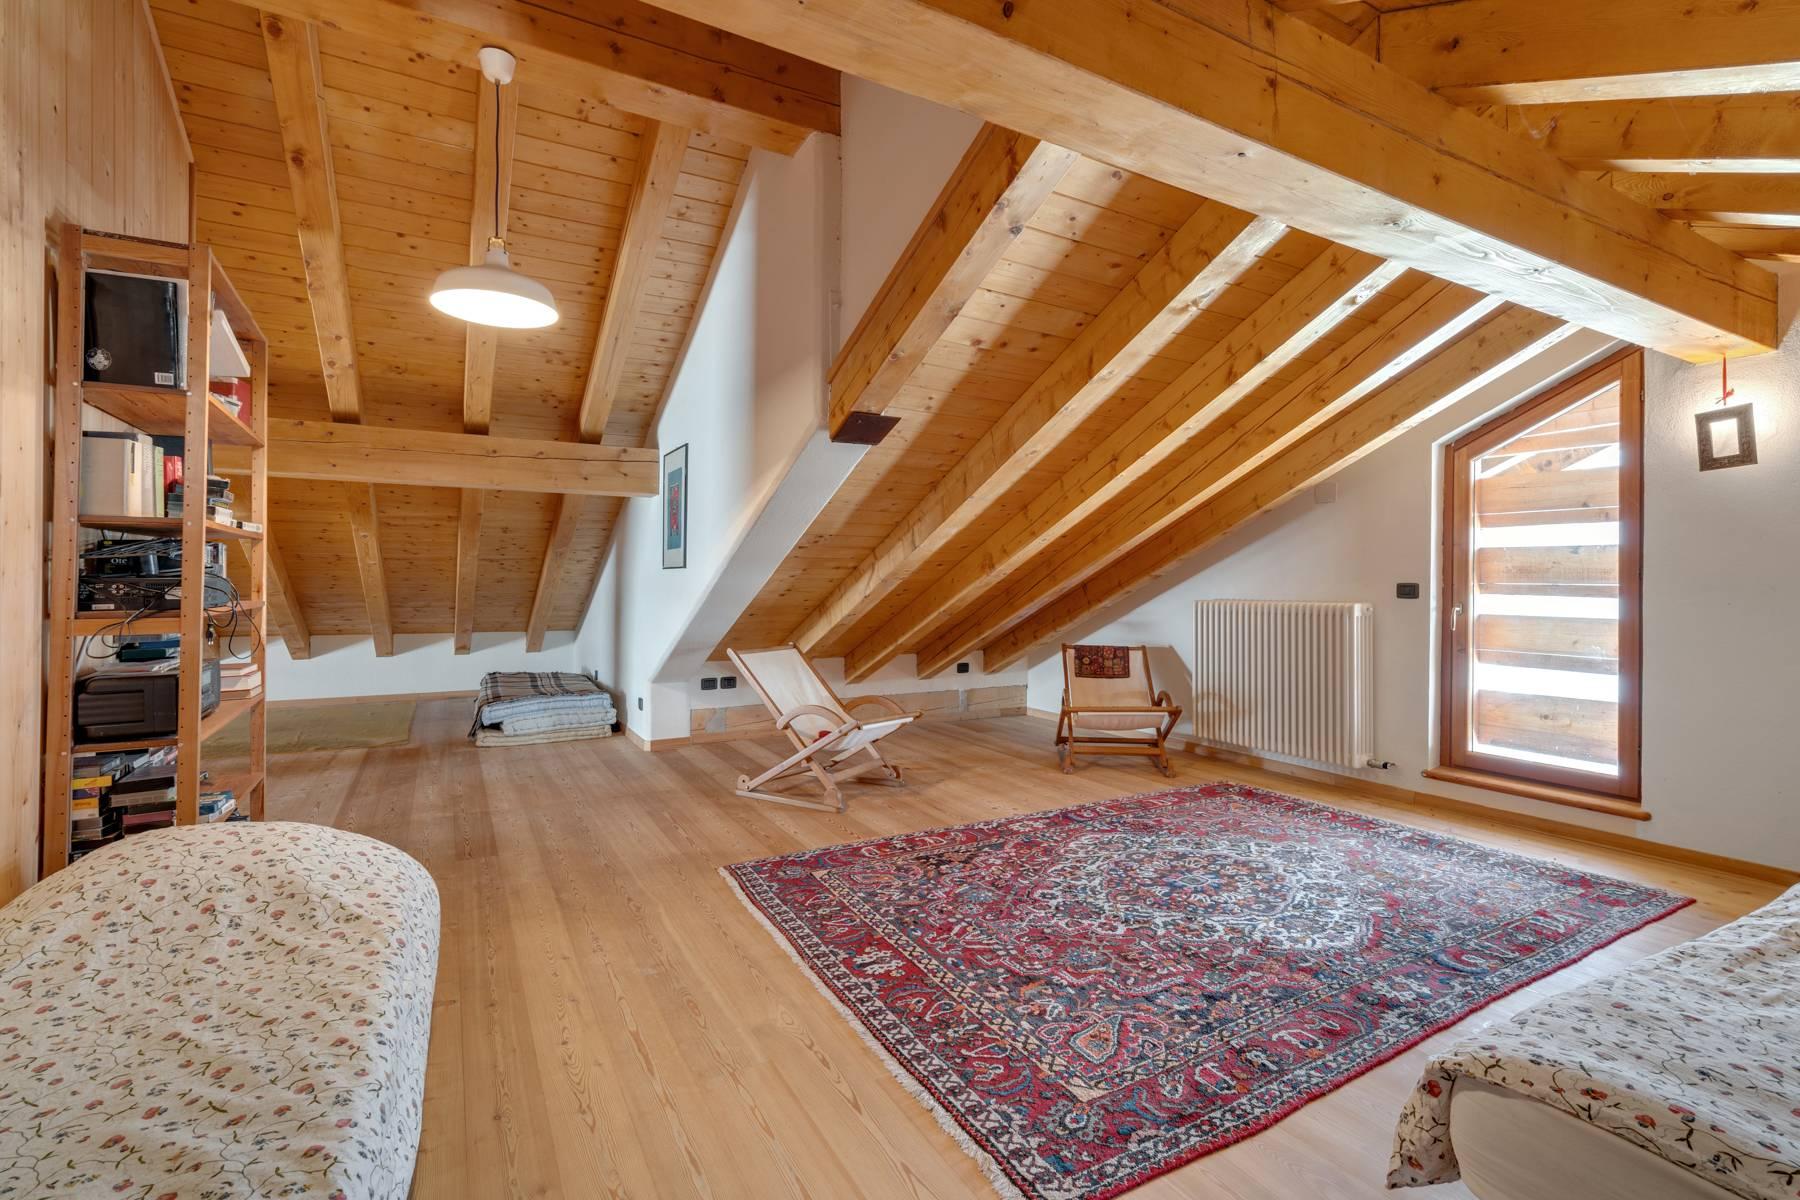 Villa in Vendita a Cogne: 5 locali, 384 mq - Foto 11